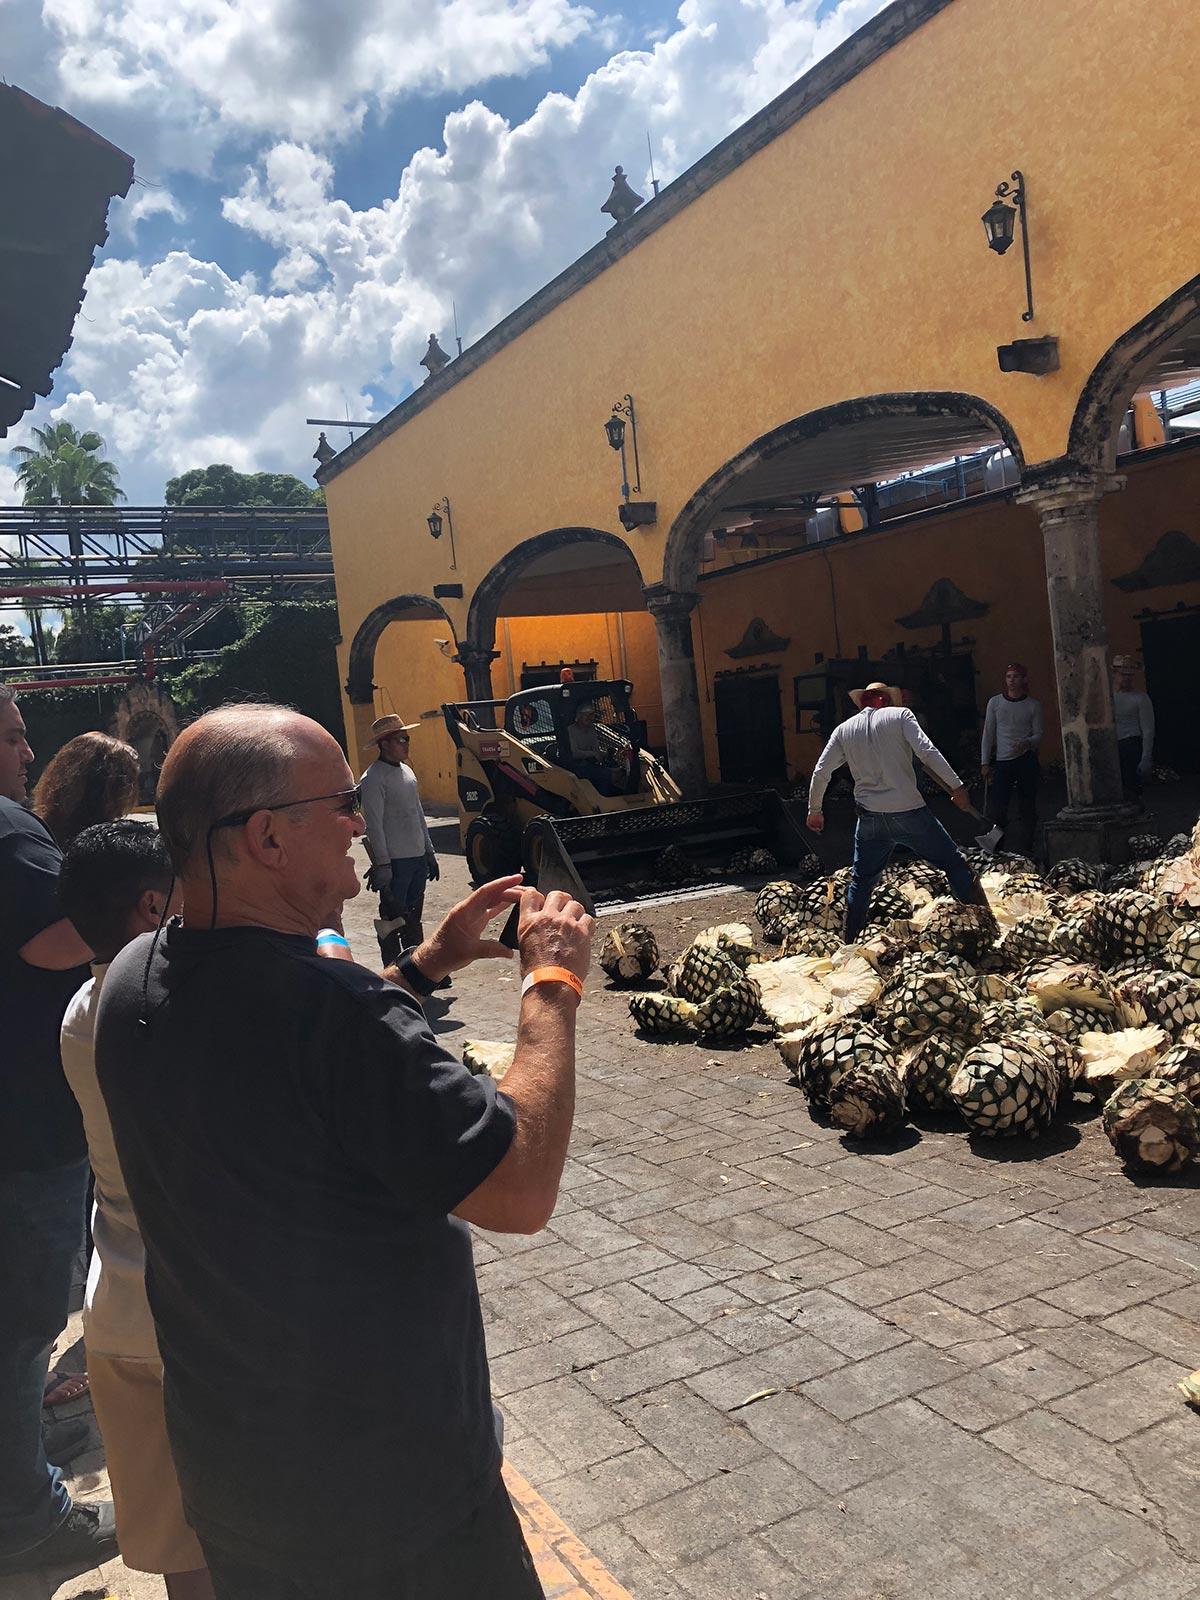 Tequila jalisco & Ixtlan del Río - My Tour Vallarta